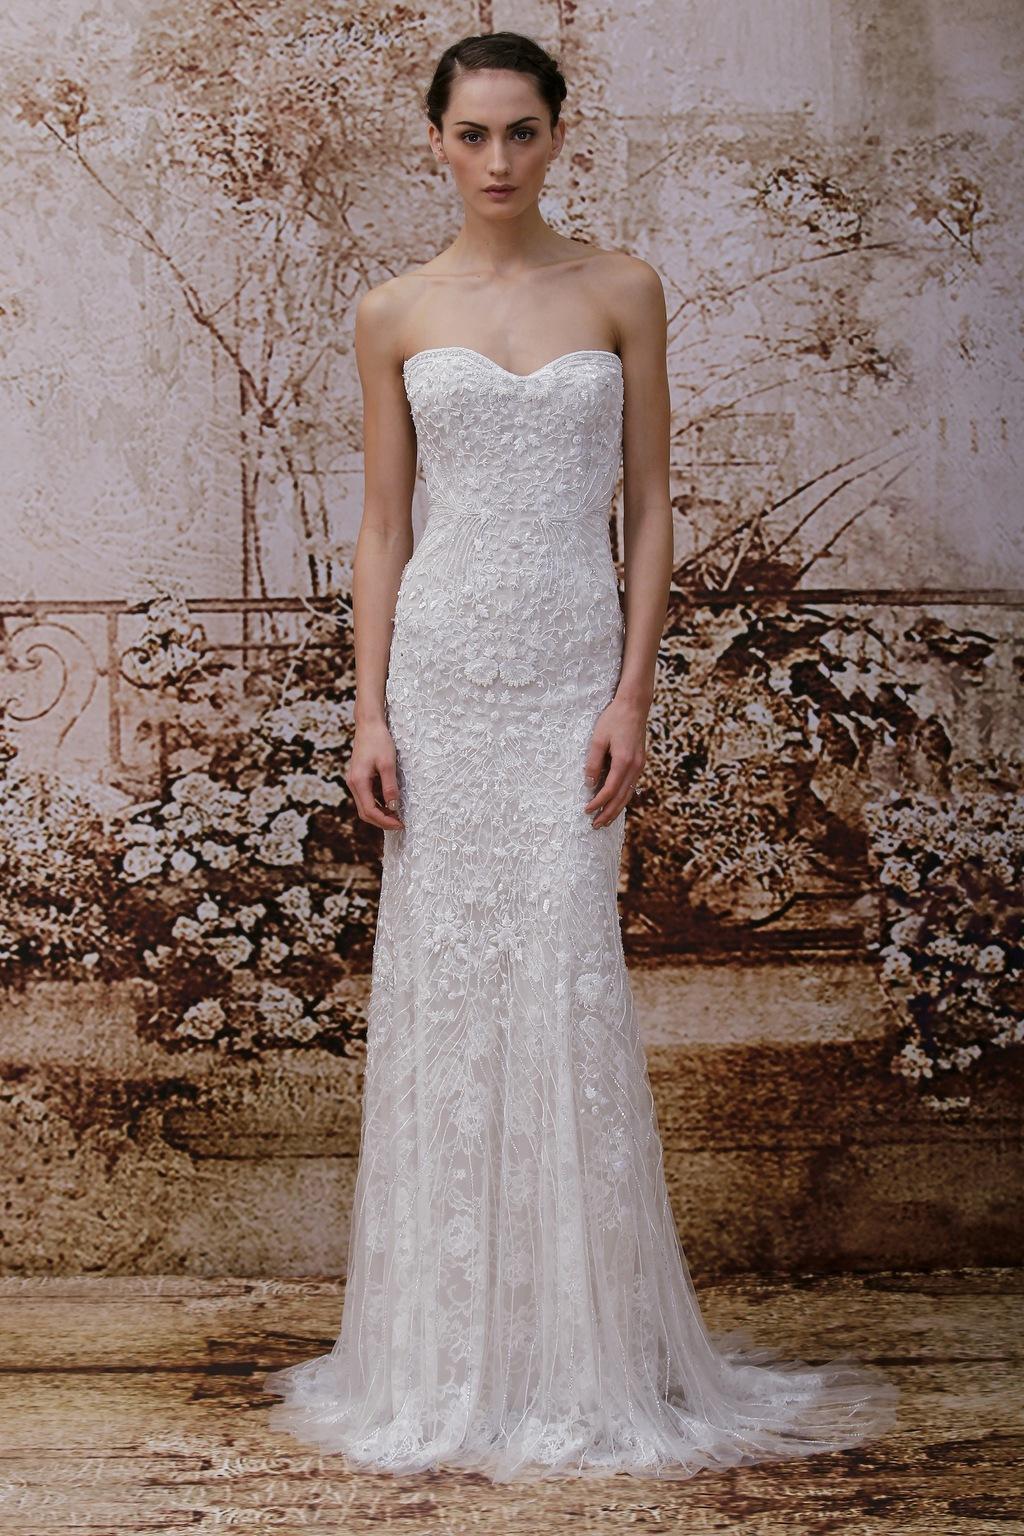 Wedding-dress-by-monique-lhuillier-fall-2014-bridal-look-15.full